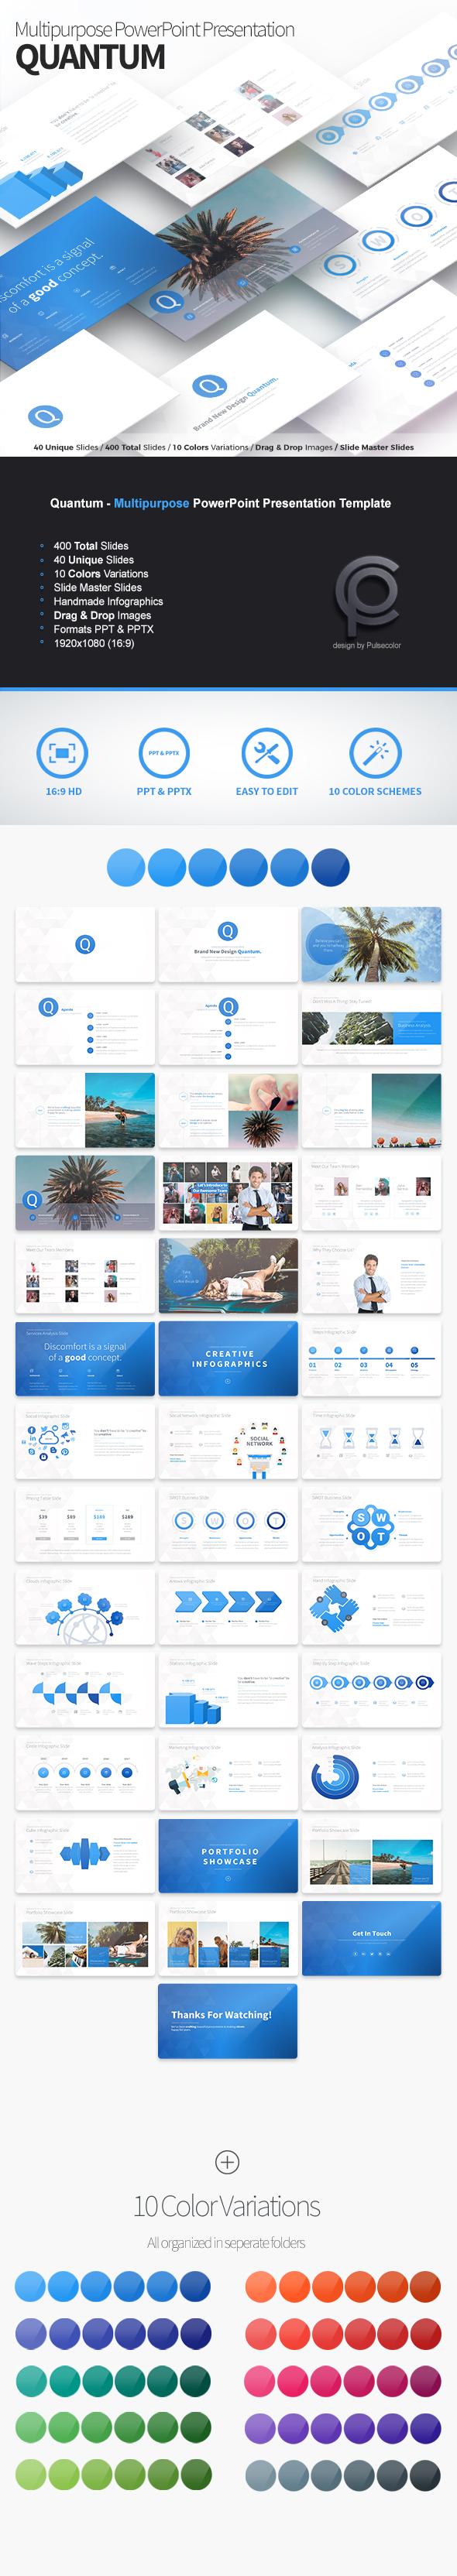 Quantum - Multipurpose PowerPoint Presentation - Business PowerPoint Templates